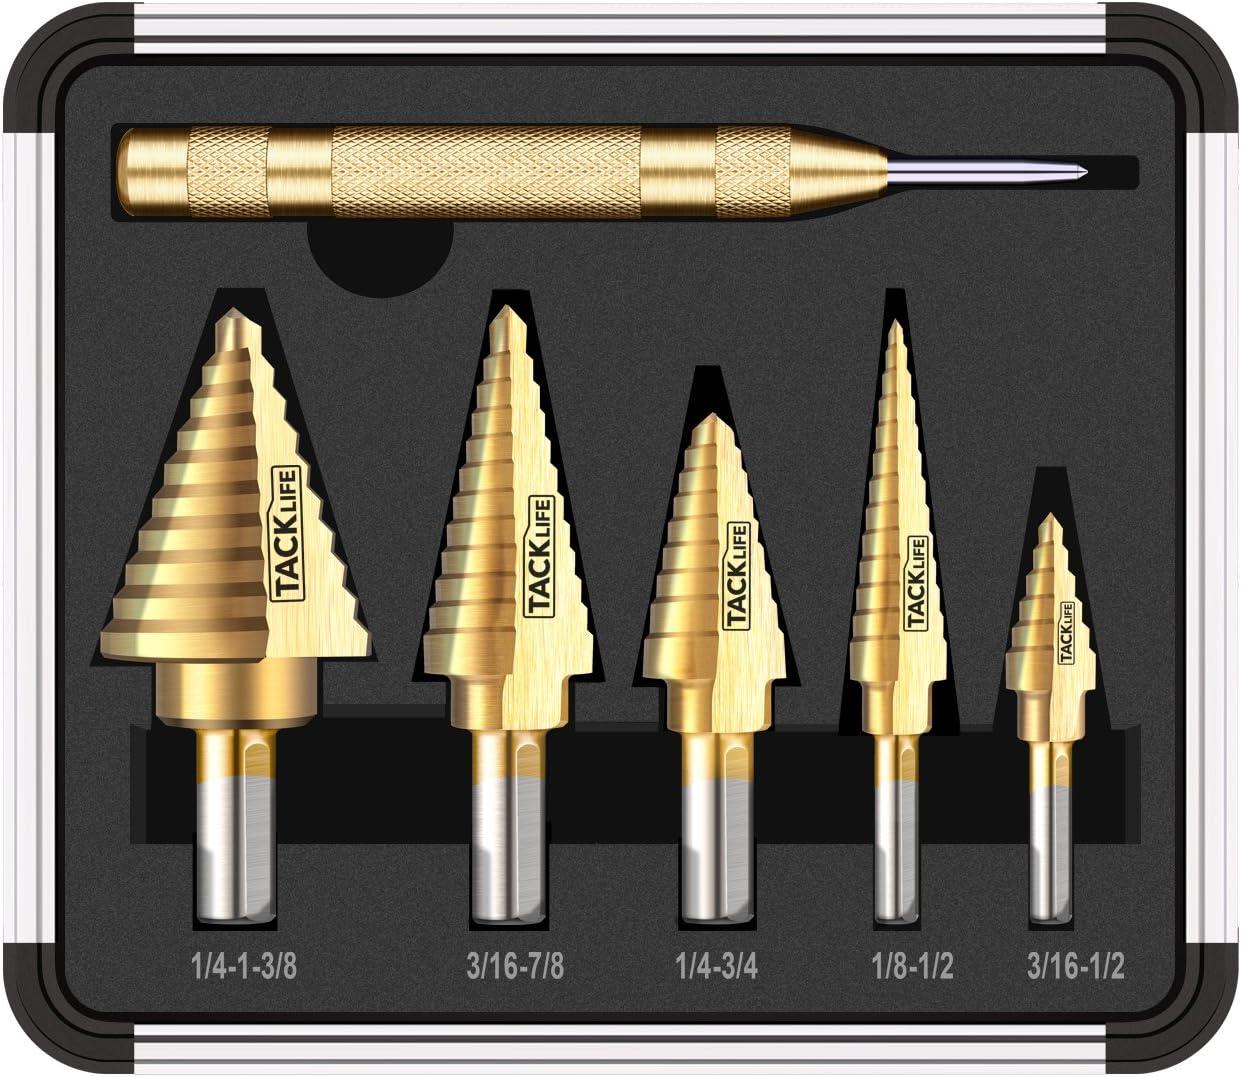 3. Tacklife PDH06 Classic Titanium Step Drill Bit Set